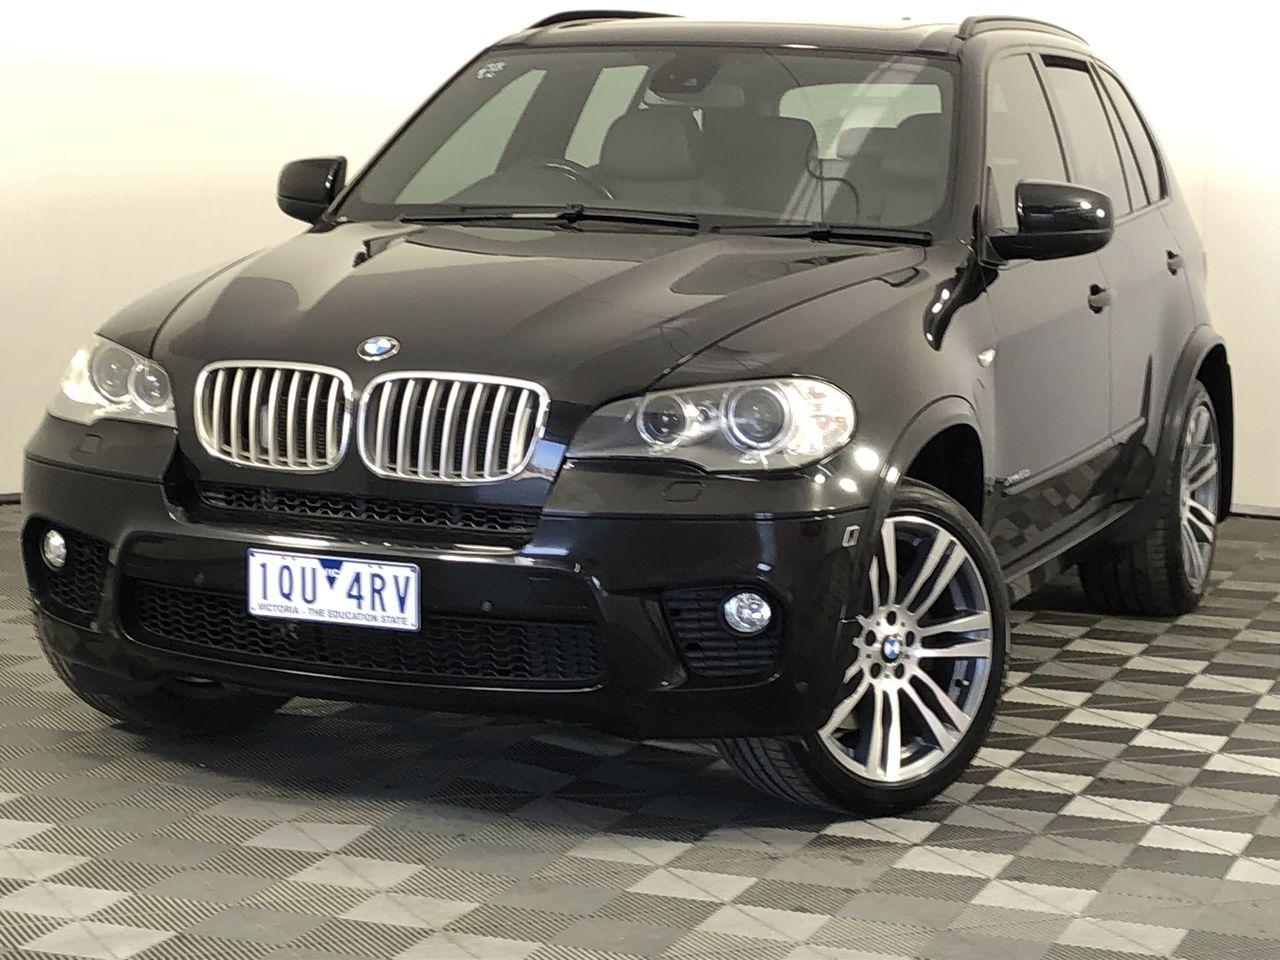 2010 BMW X5 xDrive 50i SPORT E70 LCI Automatic - 8 Speed 7 Seats Wagon